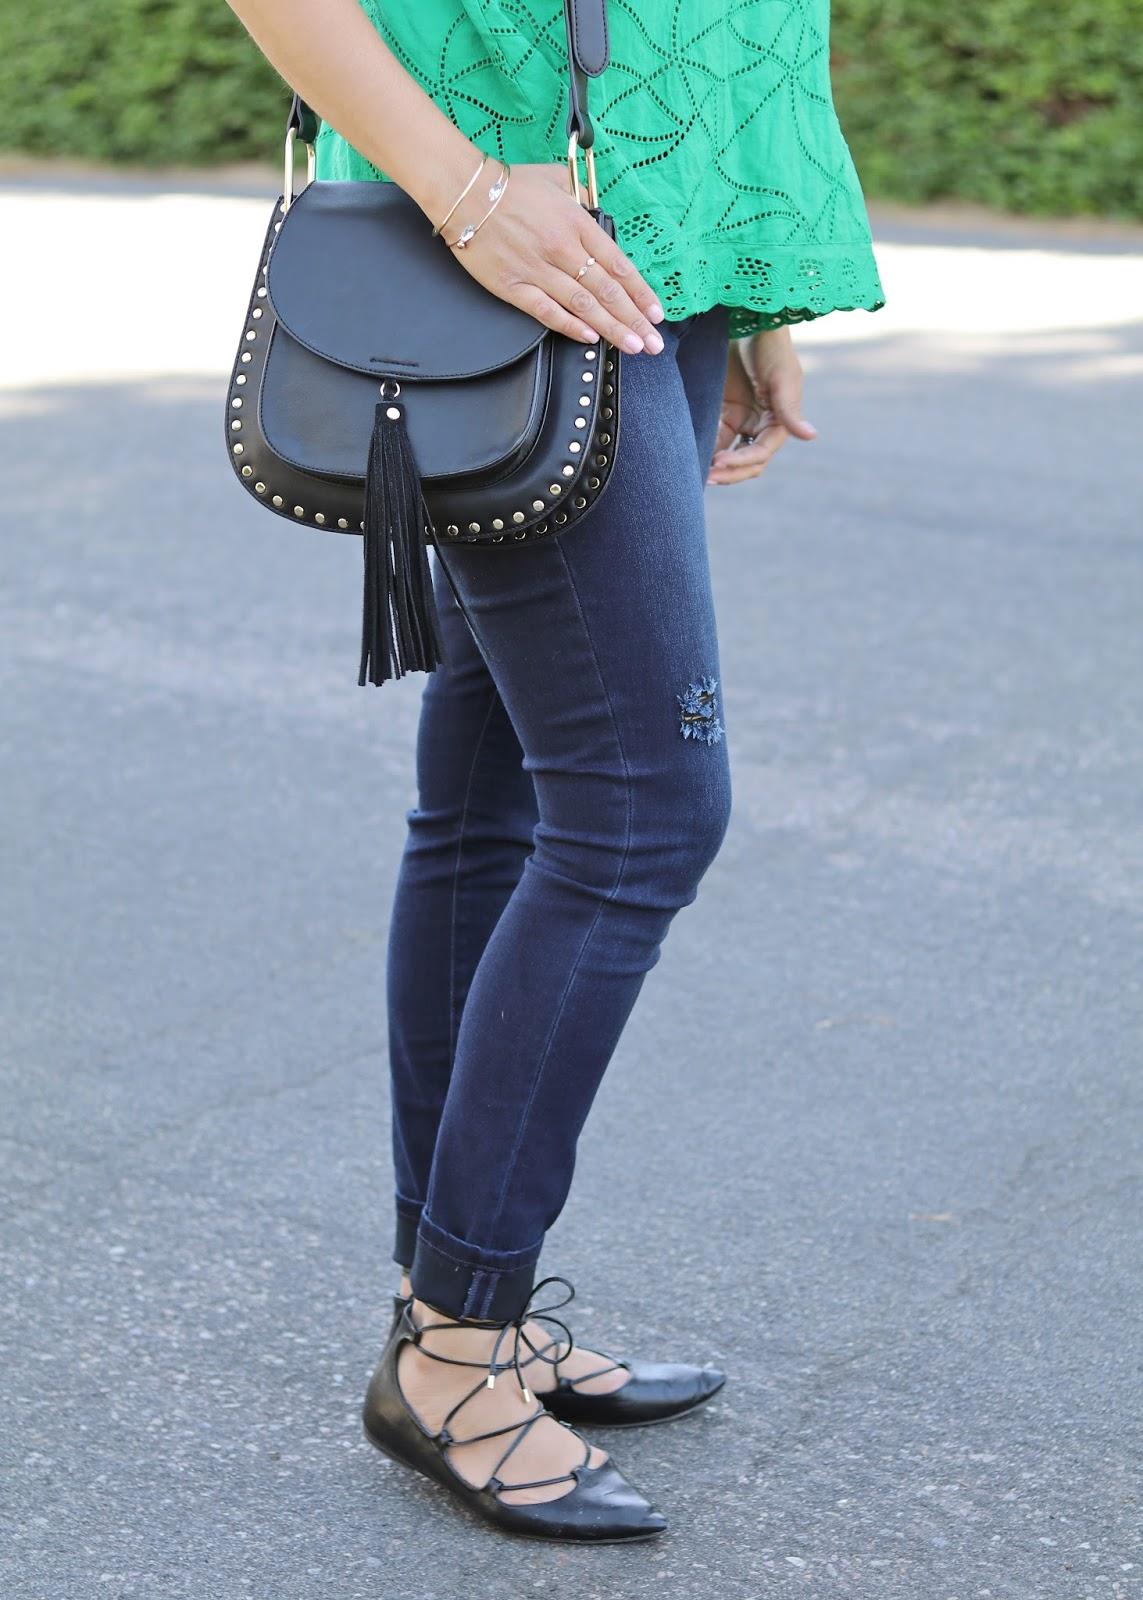 galian handbags, forever 21 black handbag, gold bracelets, black lace up flats, skinny jeans outfit